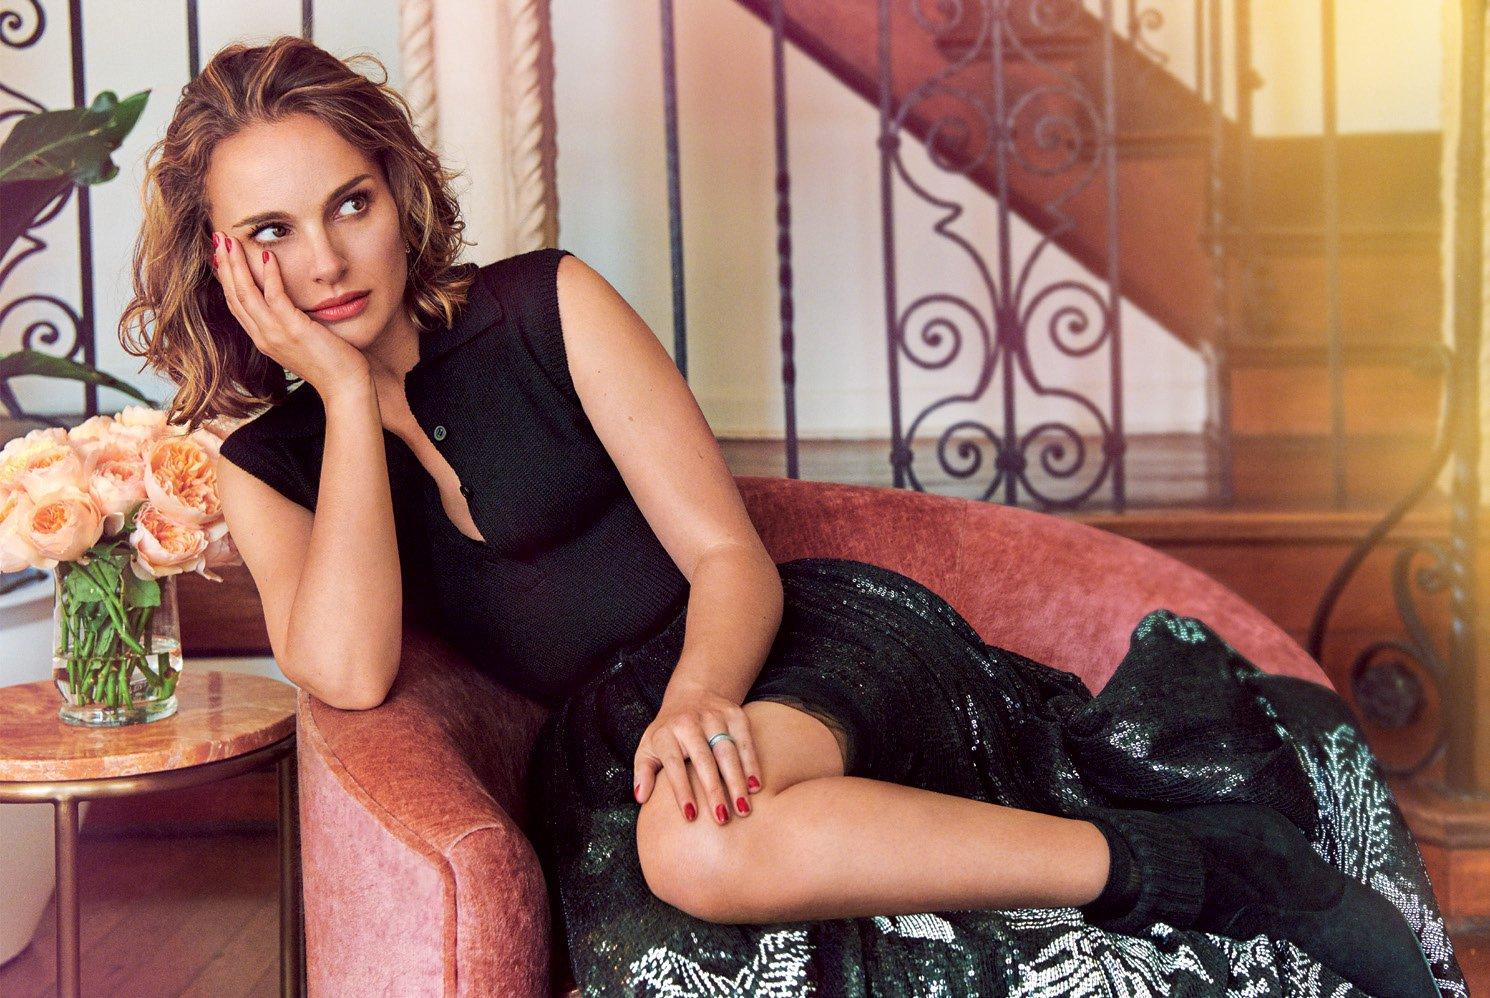 Natalie Portman in Harper's Bazaar UK September 2019 by Pamela Hanson